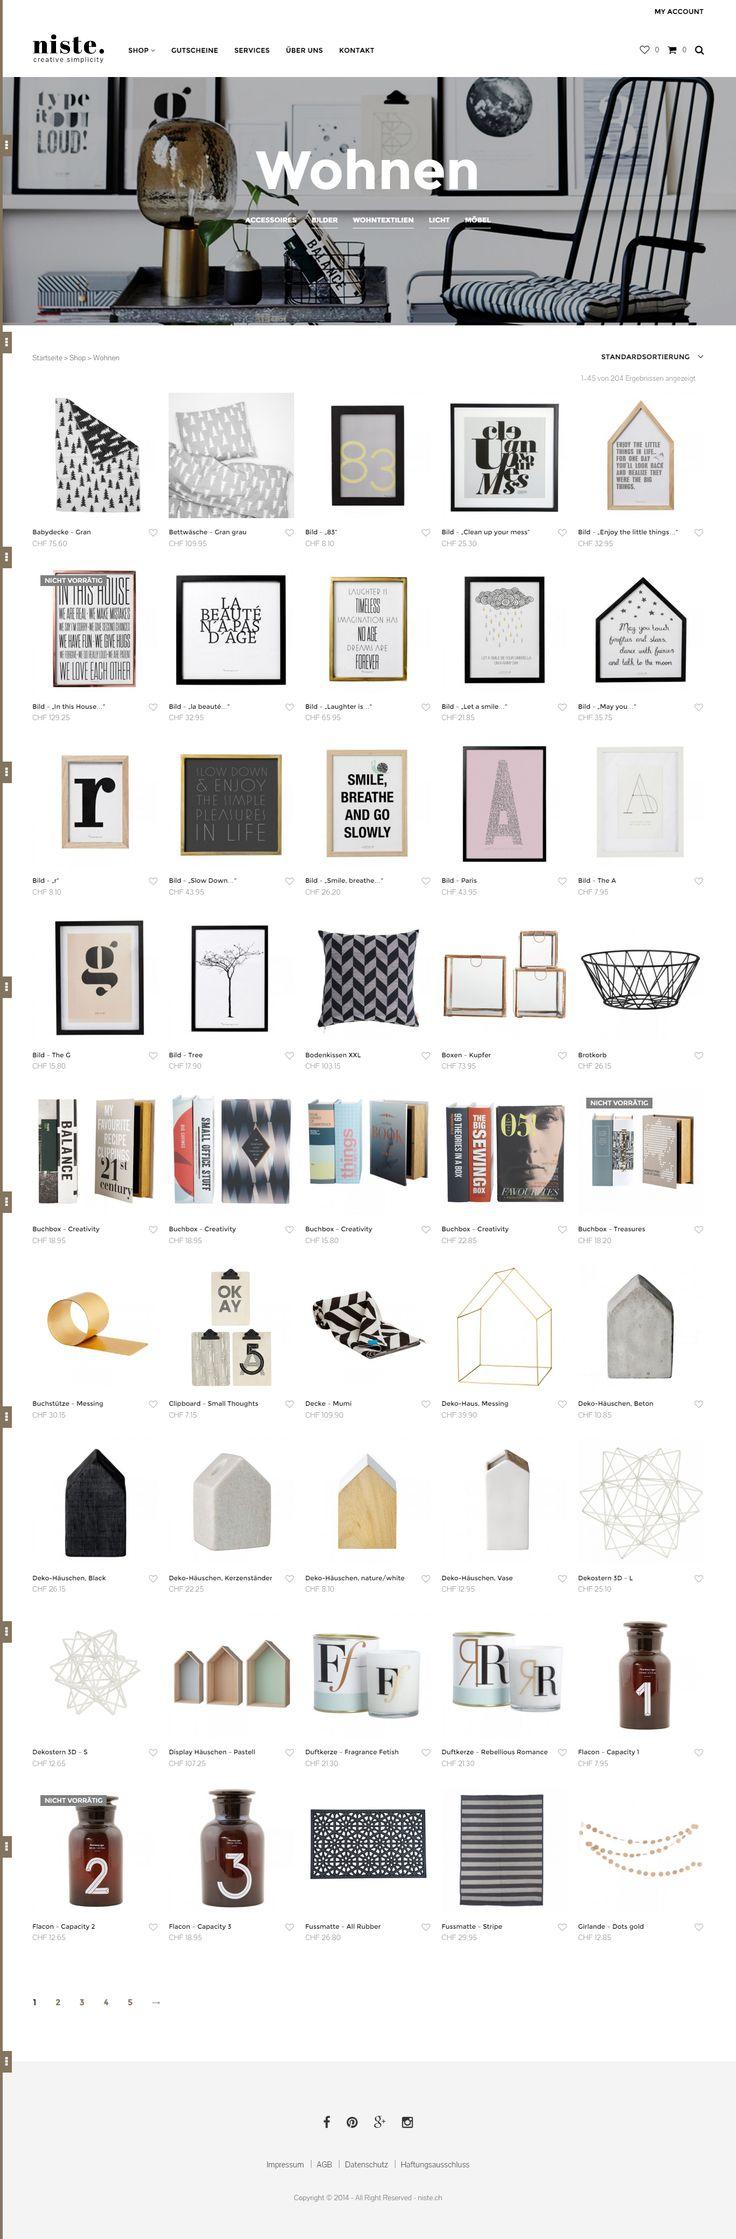 The story of Niste, an interior design online shop & consultancy built using Shopkeeper WordPress eCommerce theme from Get Bowtied. #ecommerce #interiordesign #wordpress #scandinaviandesign #bestwebsites http://www.getbowtied.com/interior-design-shop-niste-customer-stories/?utm_source=pinterest.com&utm_medium=social&utm_content=niste&utm_campaign=customer-stories